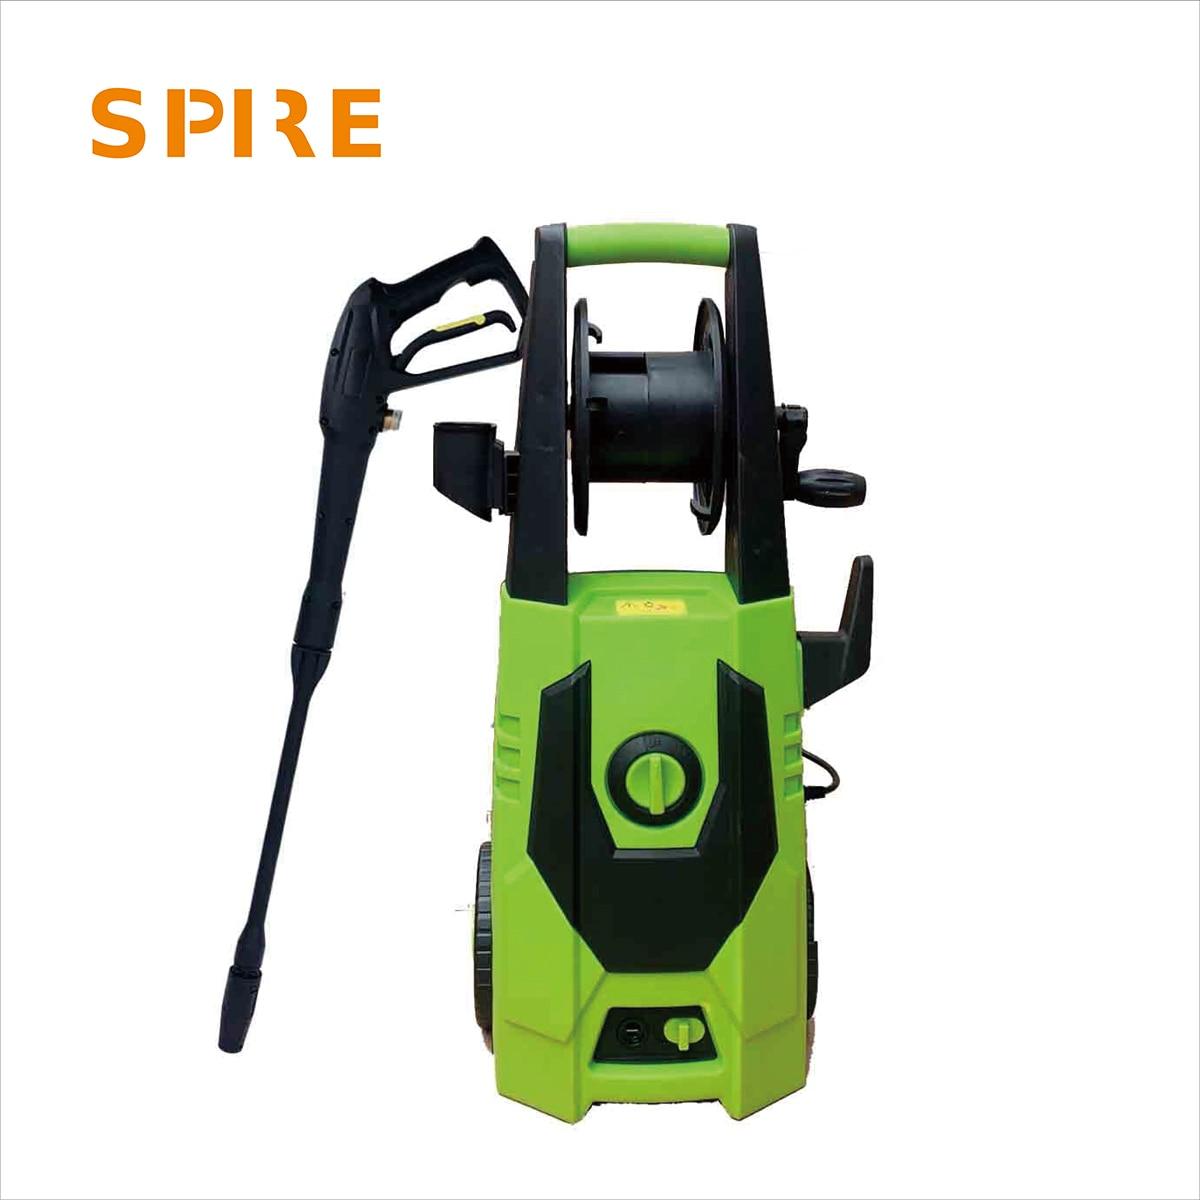 1800W High Pressure Cleaner Car Washer 110 Bar 2100 PSI Electric High Pressure Gun For Houses, Cars,